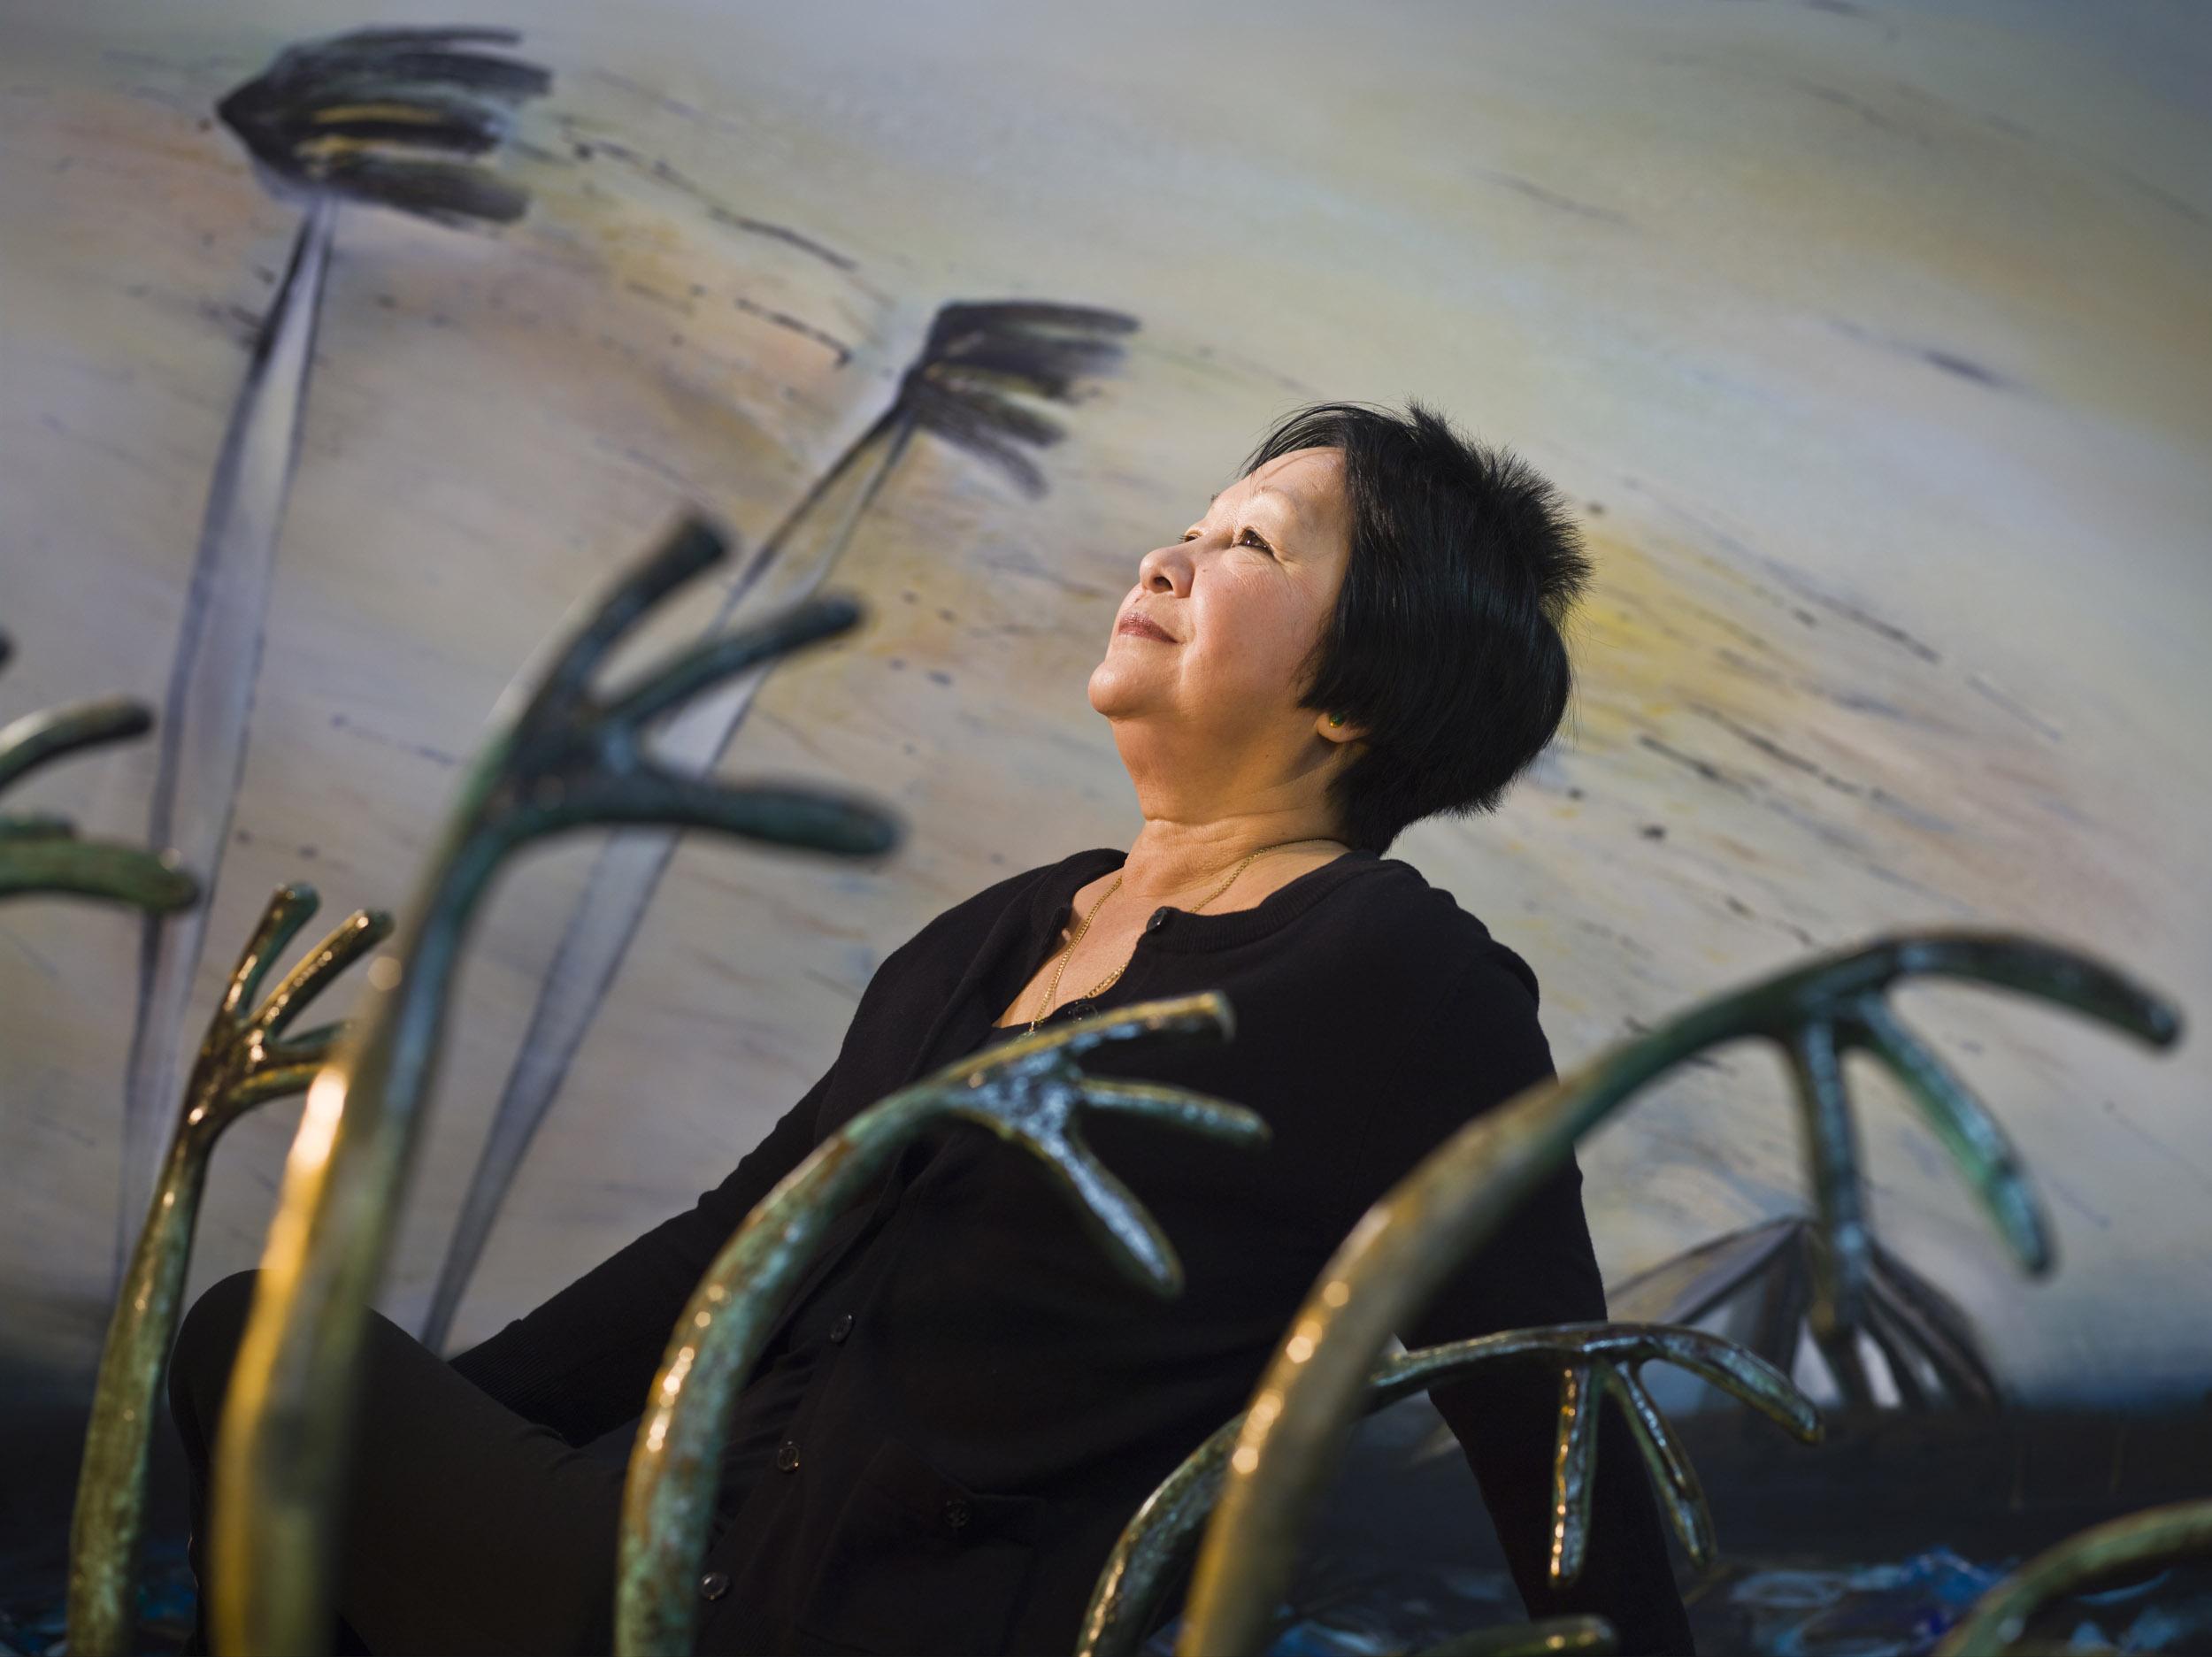 Flora Fong, painter - Illuminated Cuba - Hector Garrido, Aerial and human photography